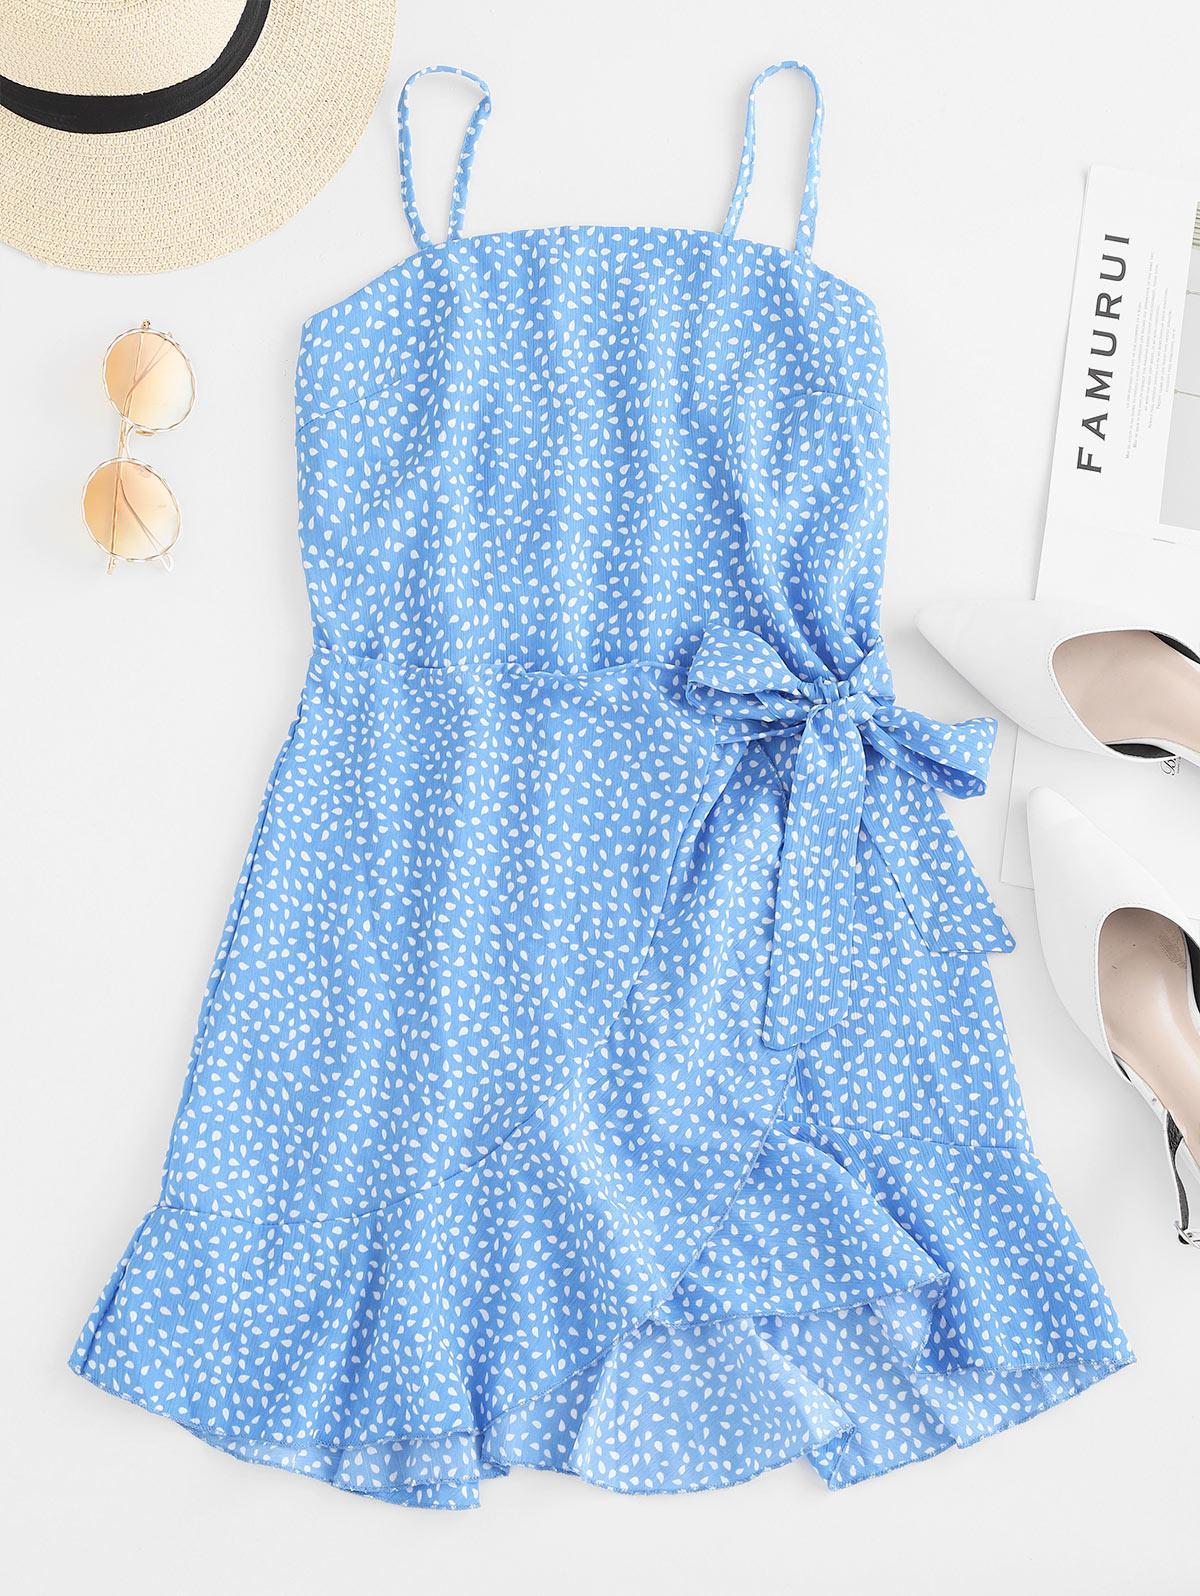 Overlap Ruffles Raindrop Print Cami Dress, Blue